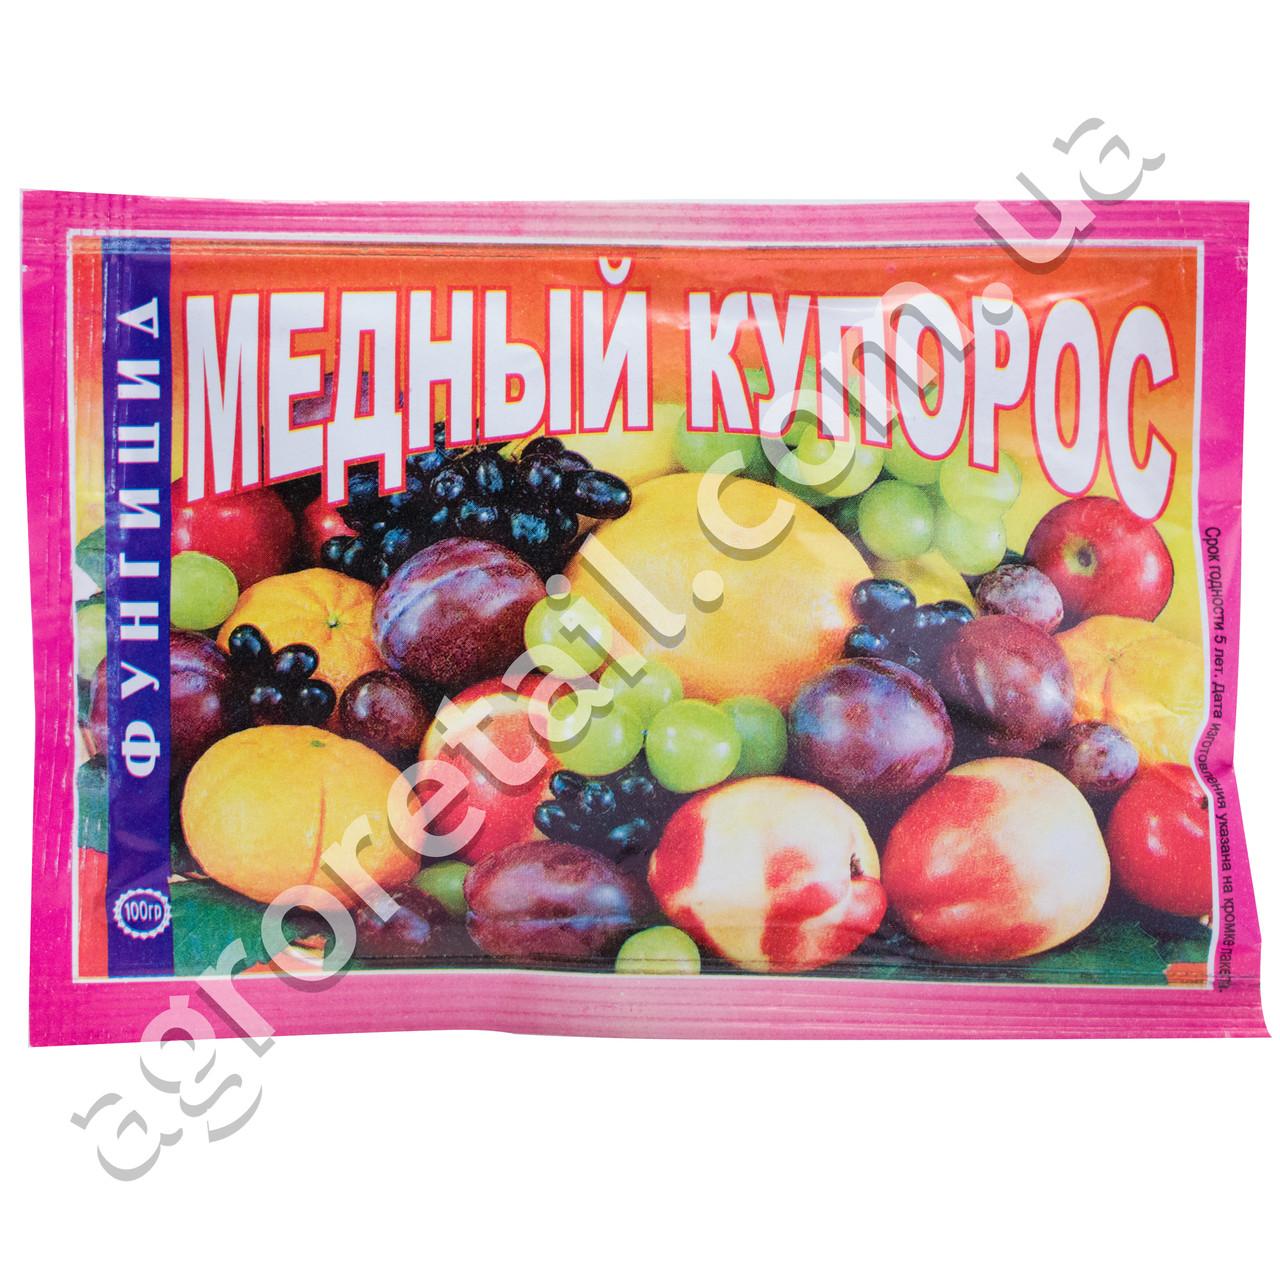 Медный купорос 100 г Фармбиомед